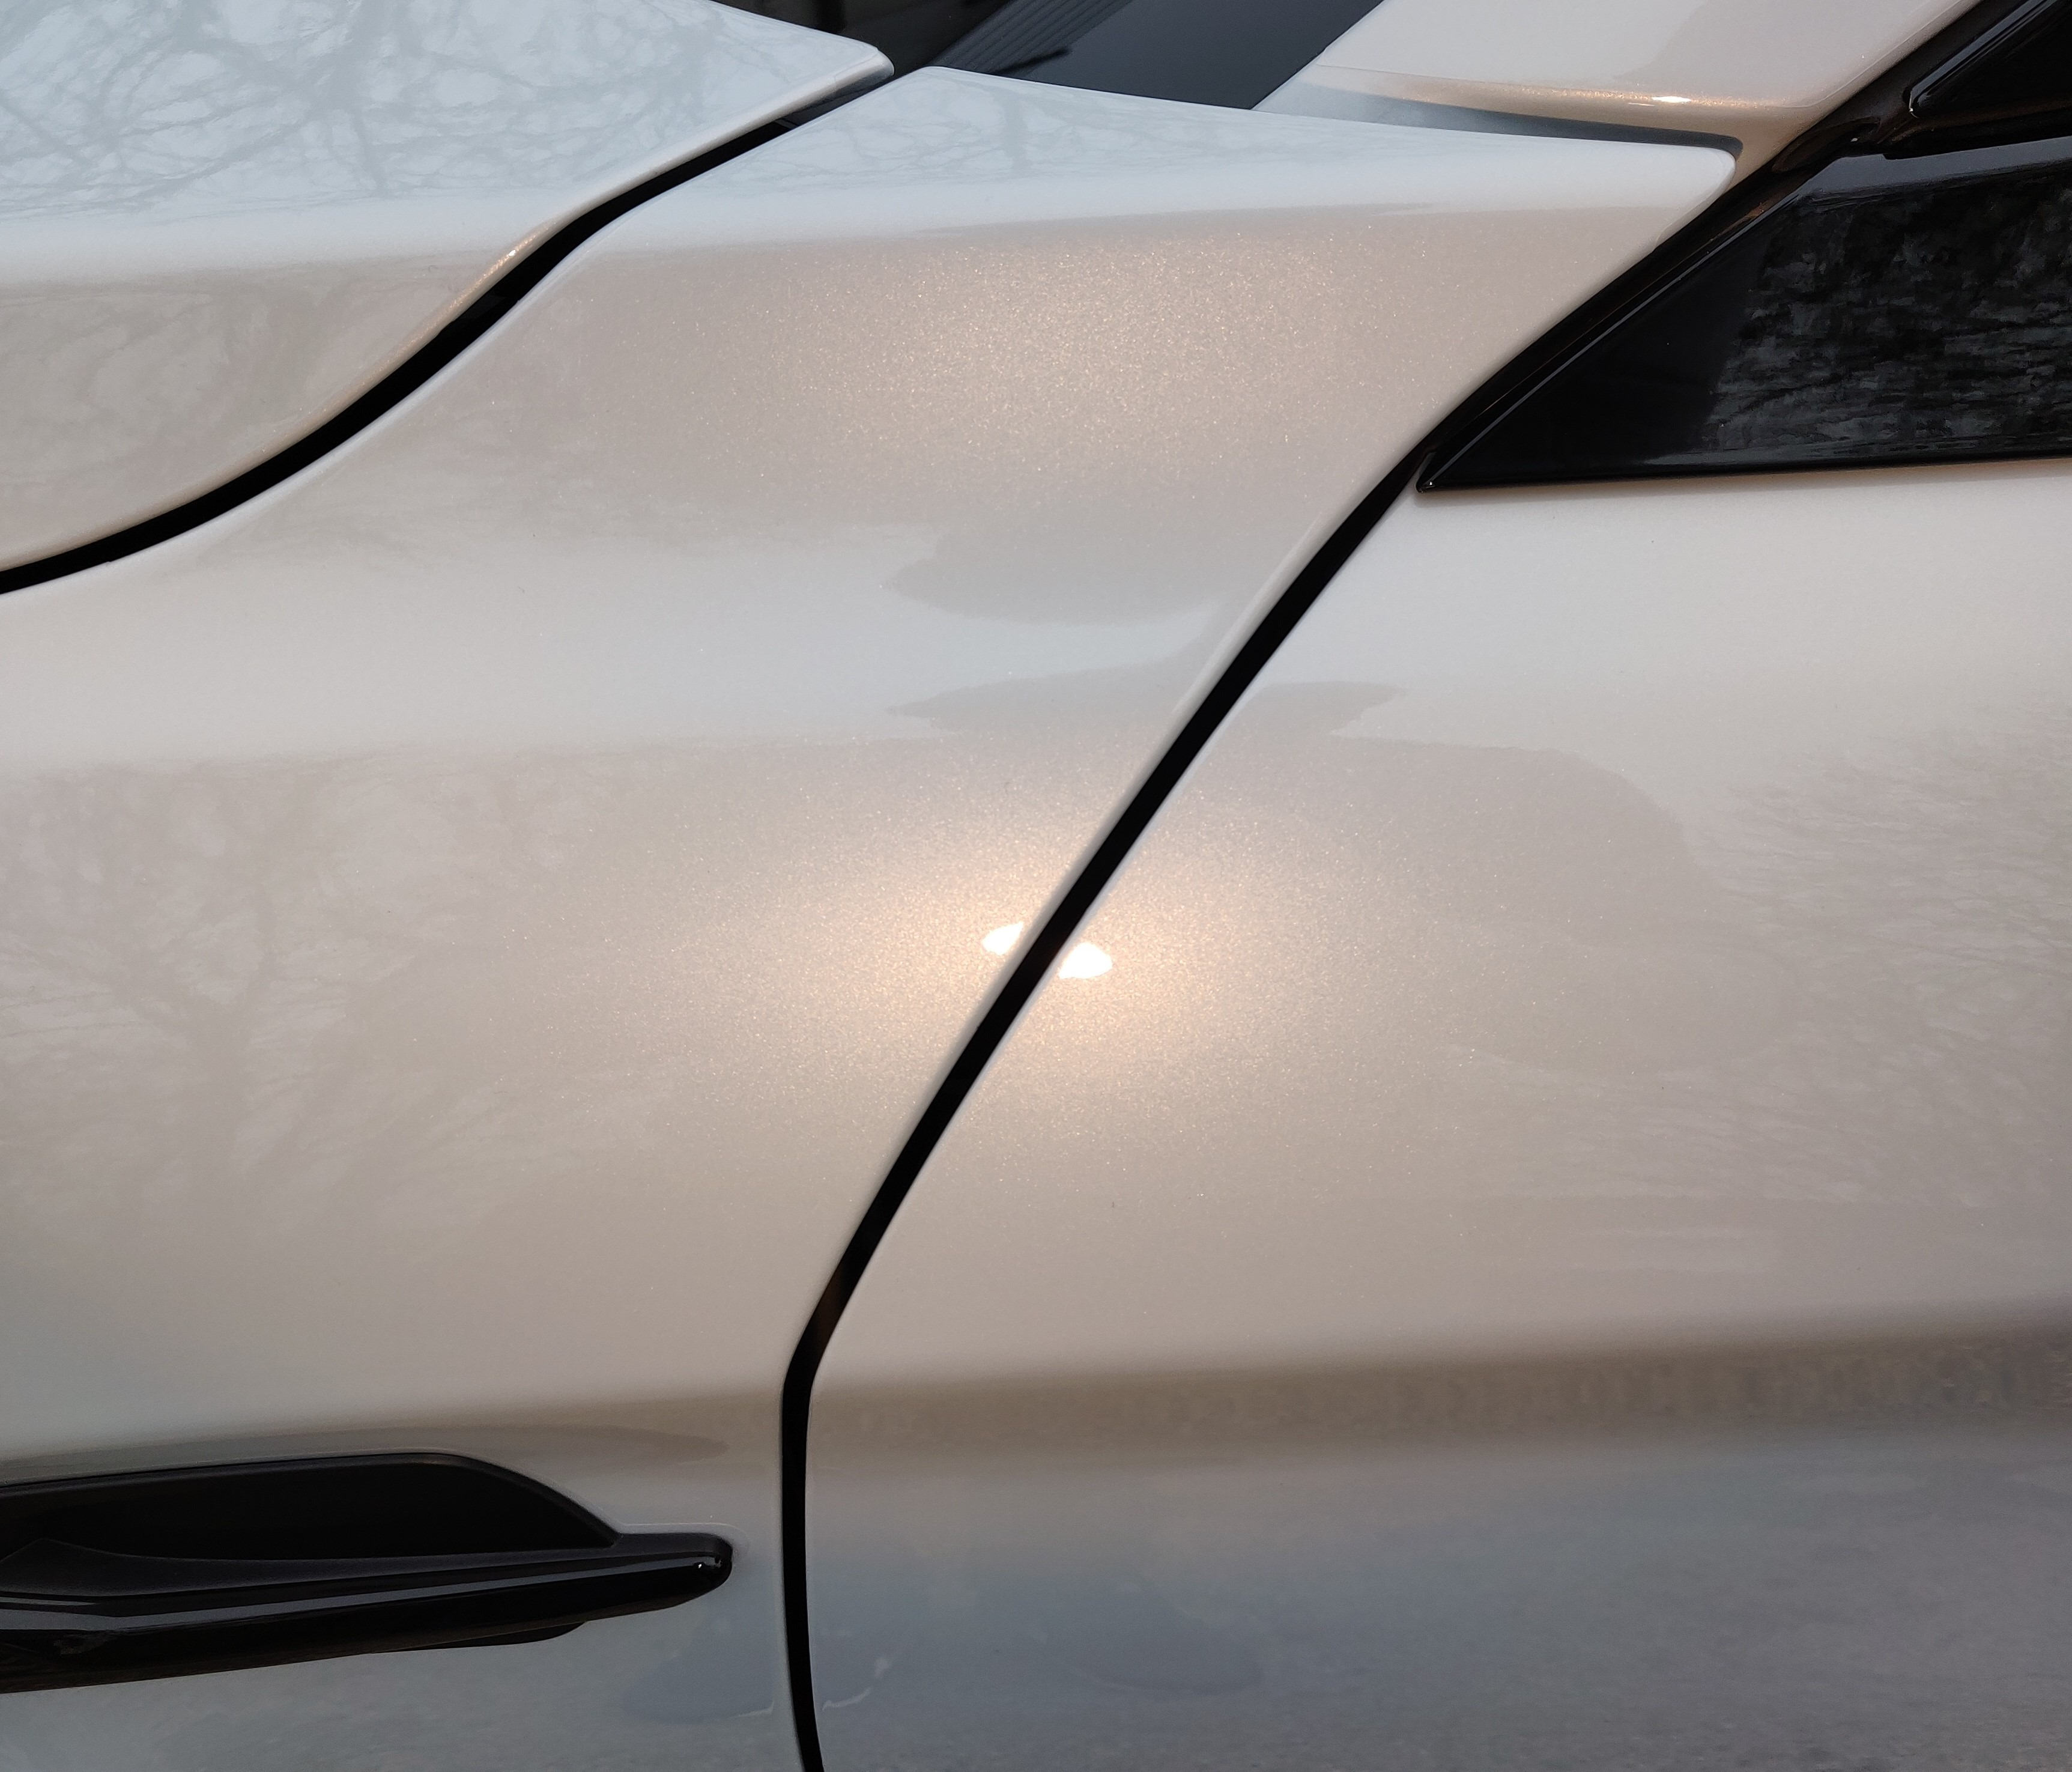 BMW M2 Lackschutzfolie Keramikversiegelung